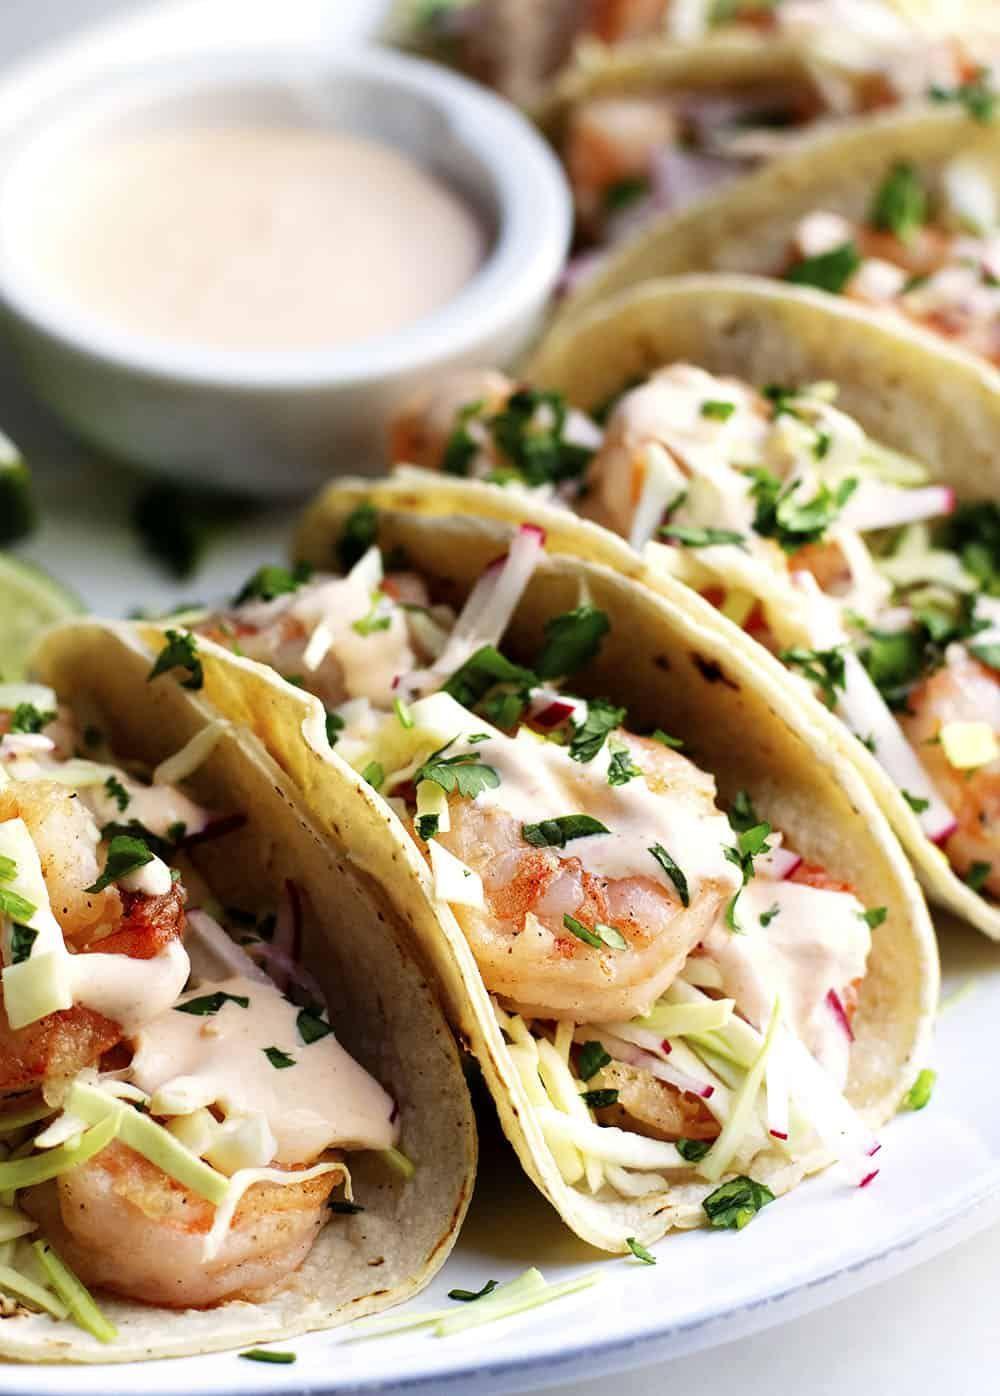 Shrimp Tacos images